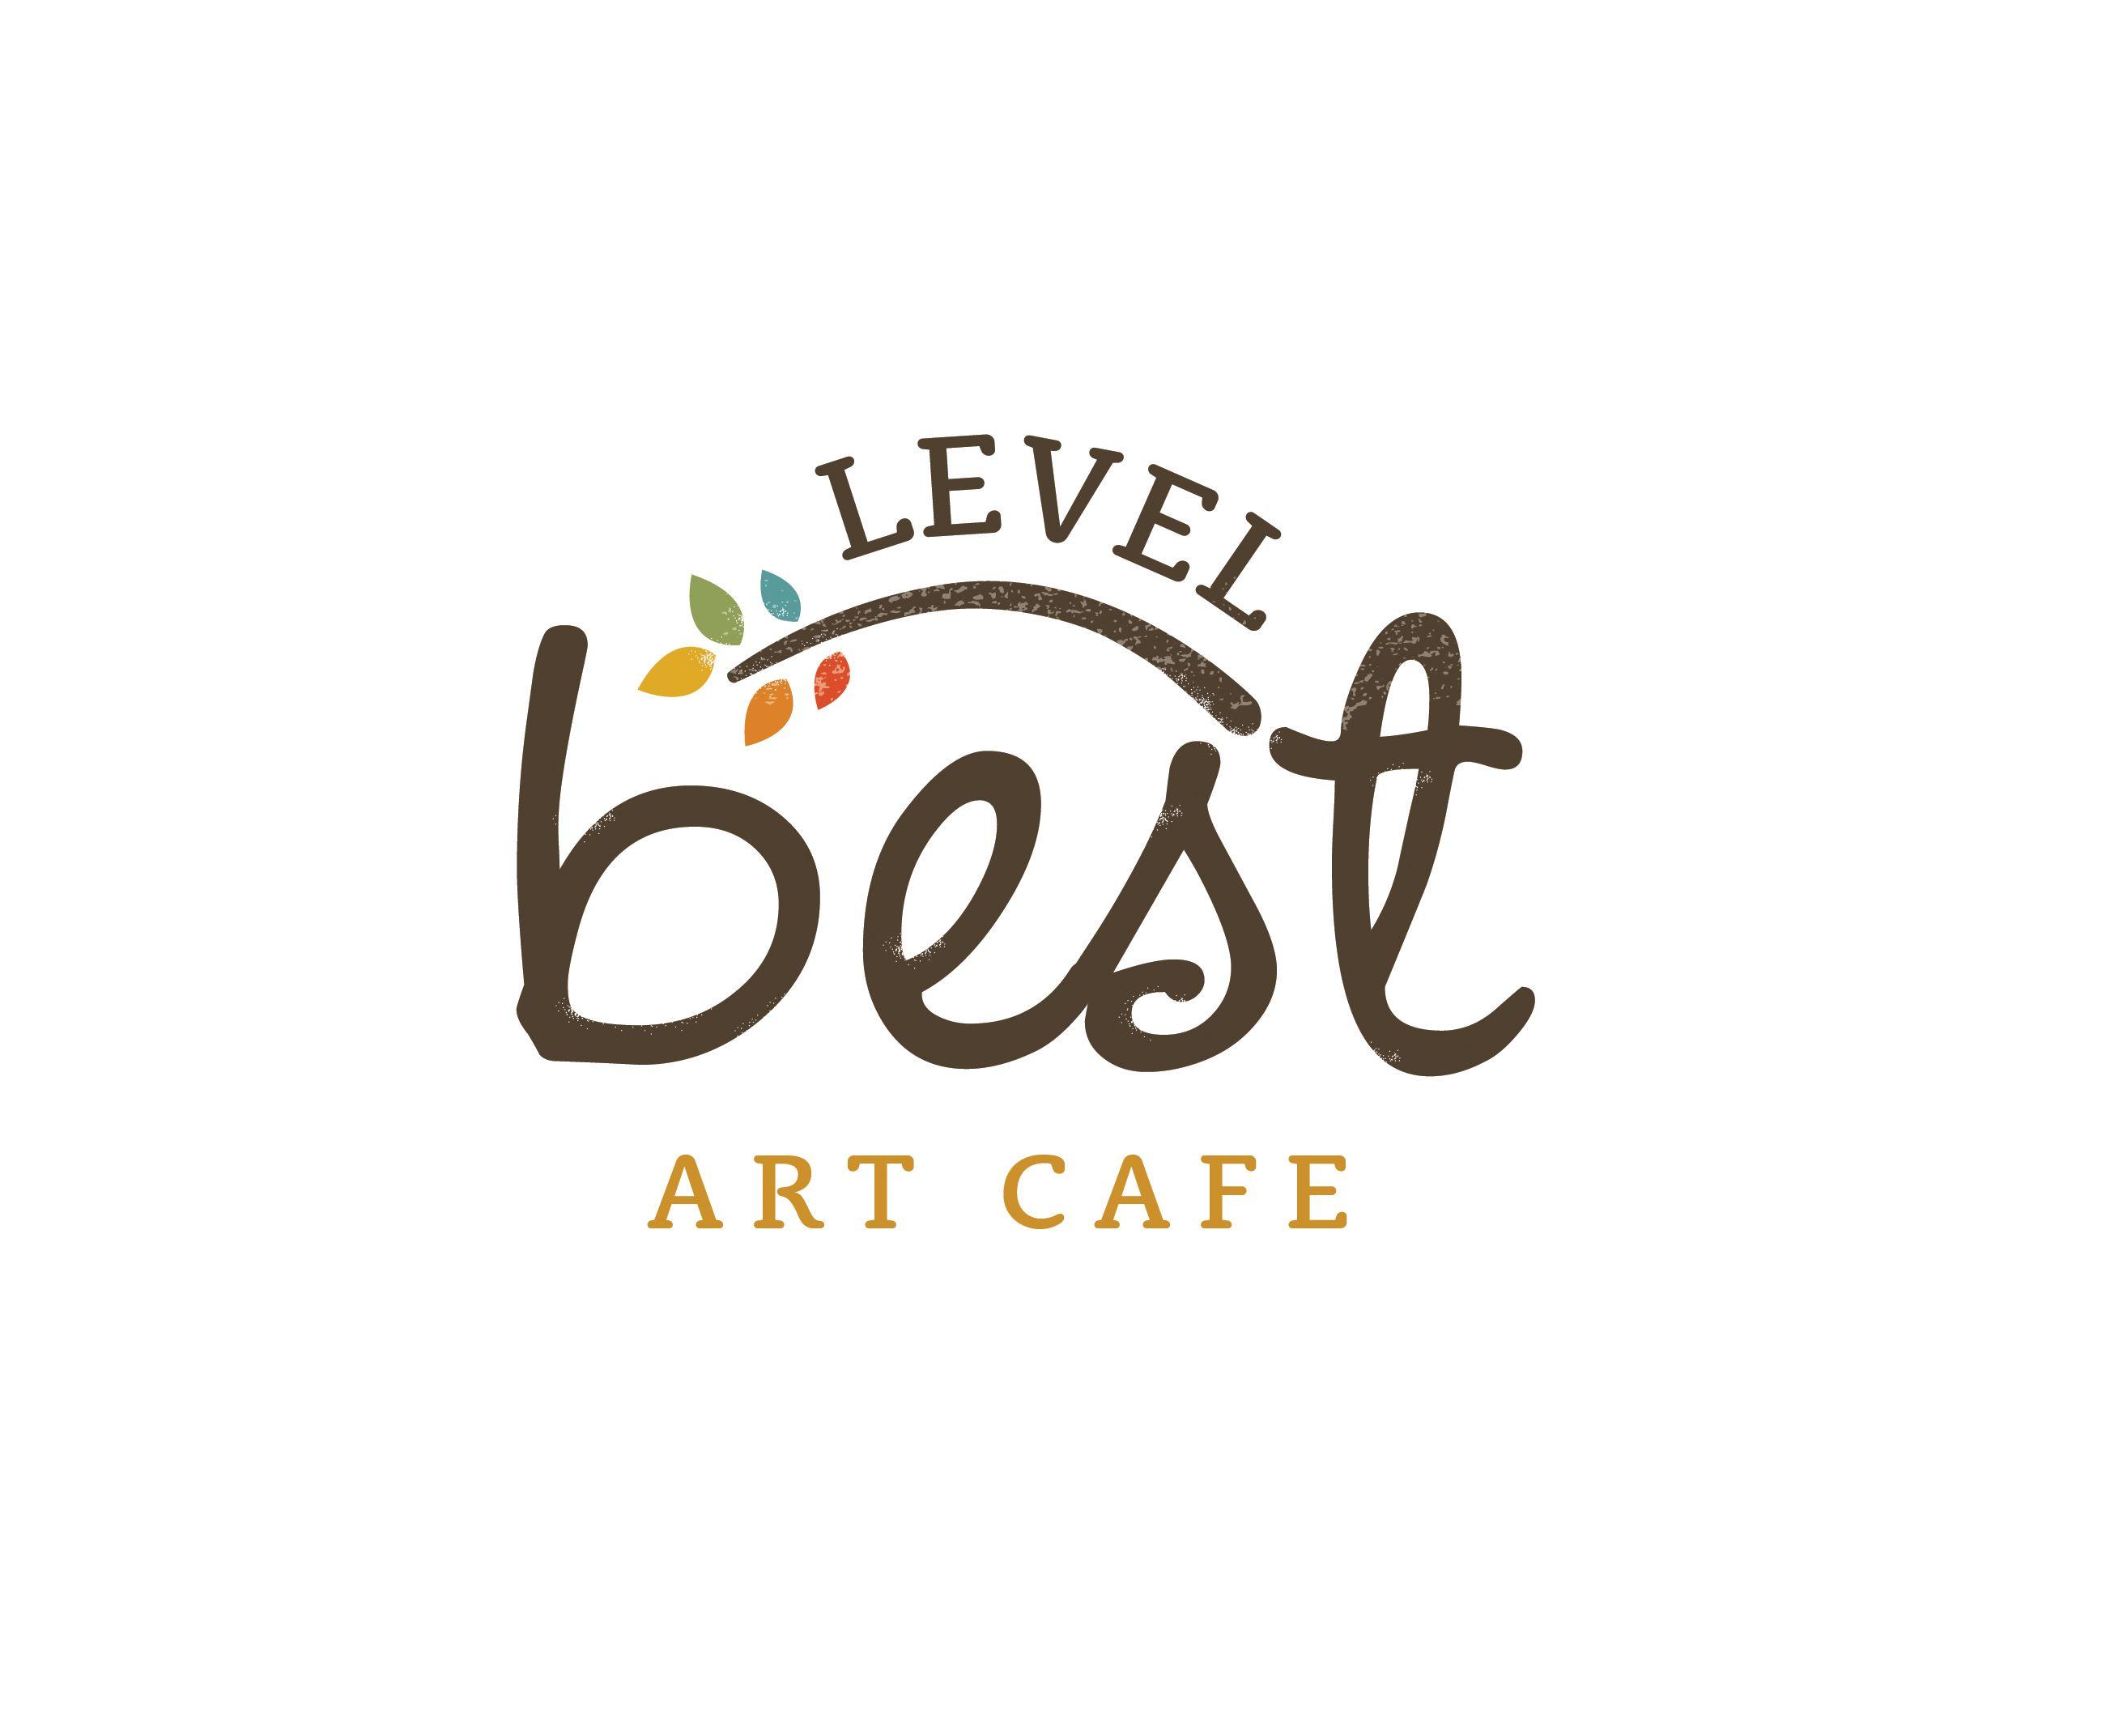 Level Best Art Cafe Logo Design logo design www